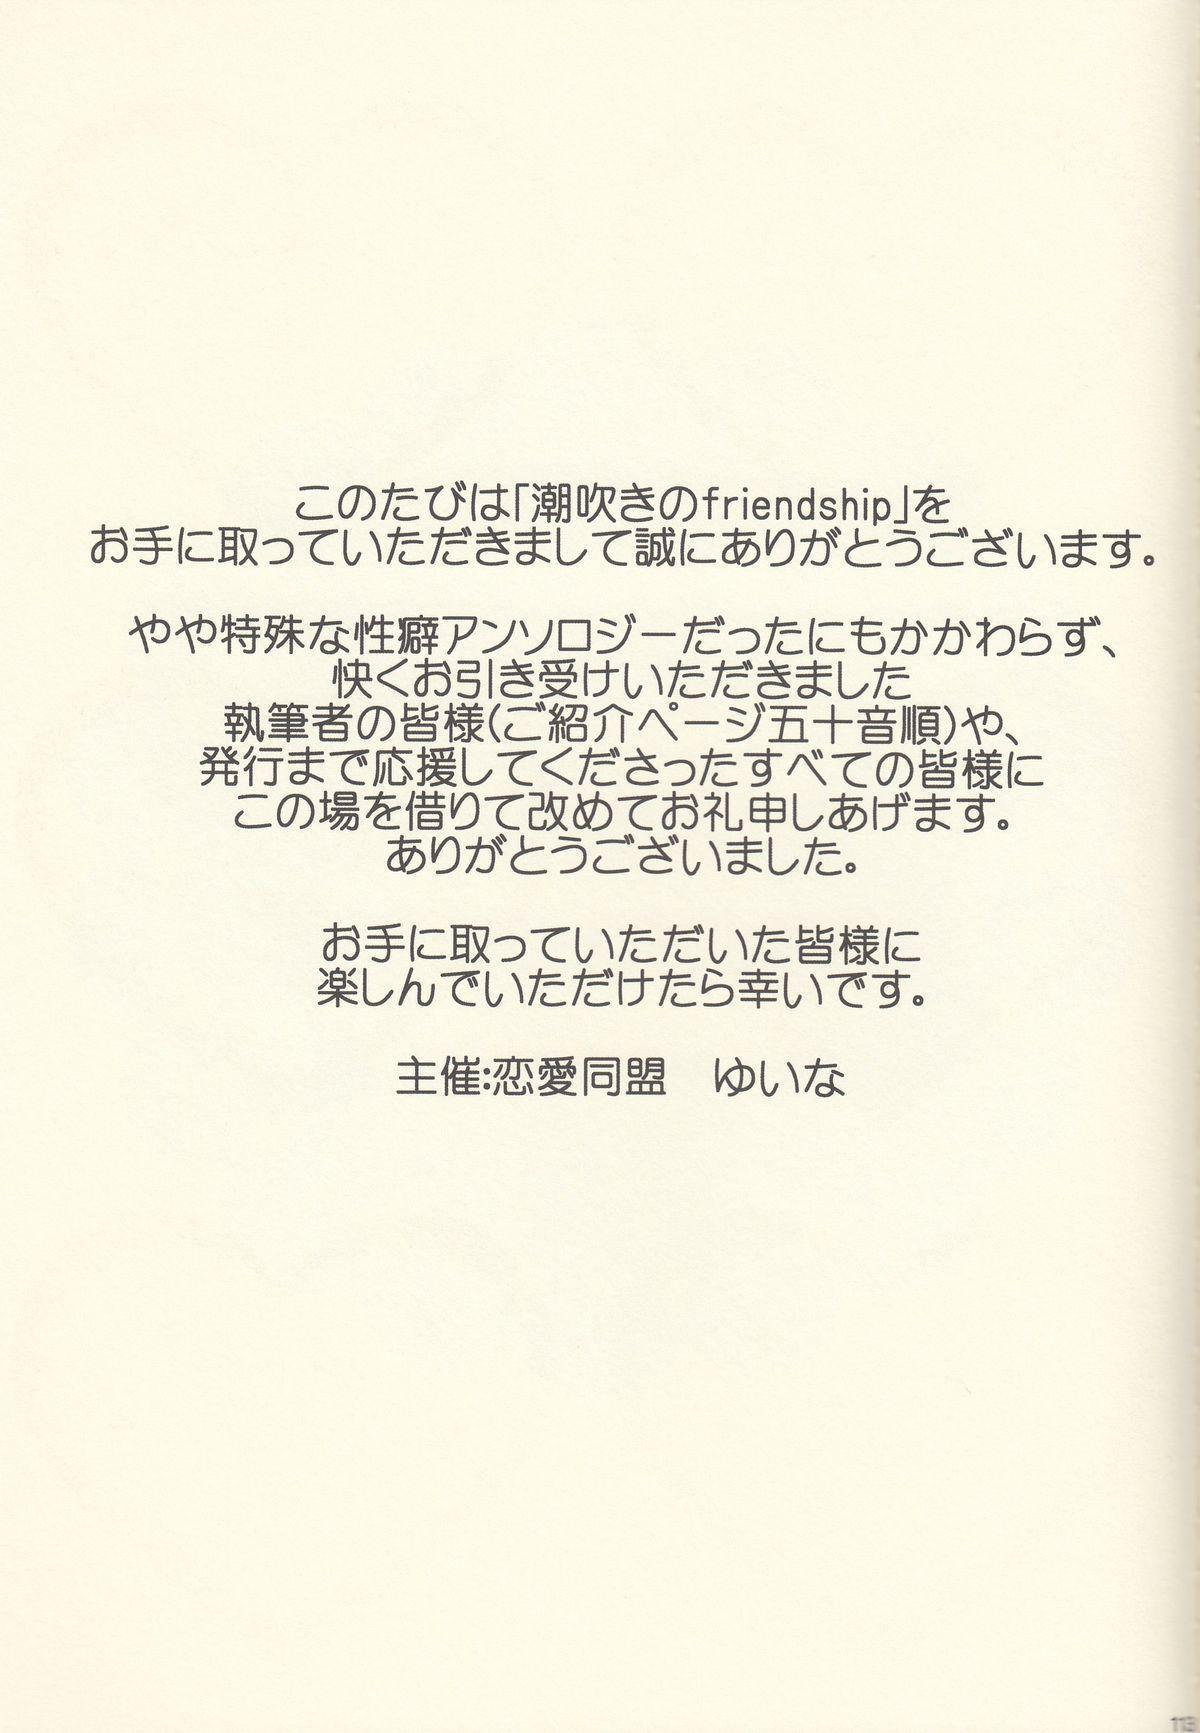 Shiofuki no Friendship - Makoto ♥ Haruka Squirting Anthology 69